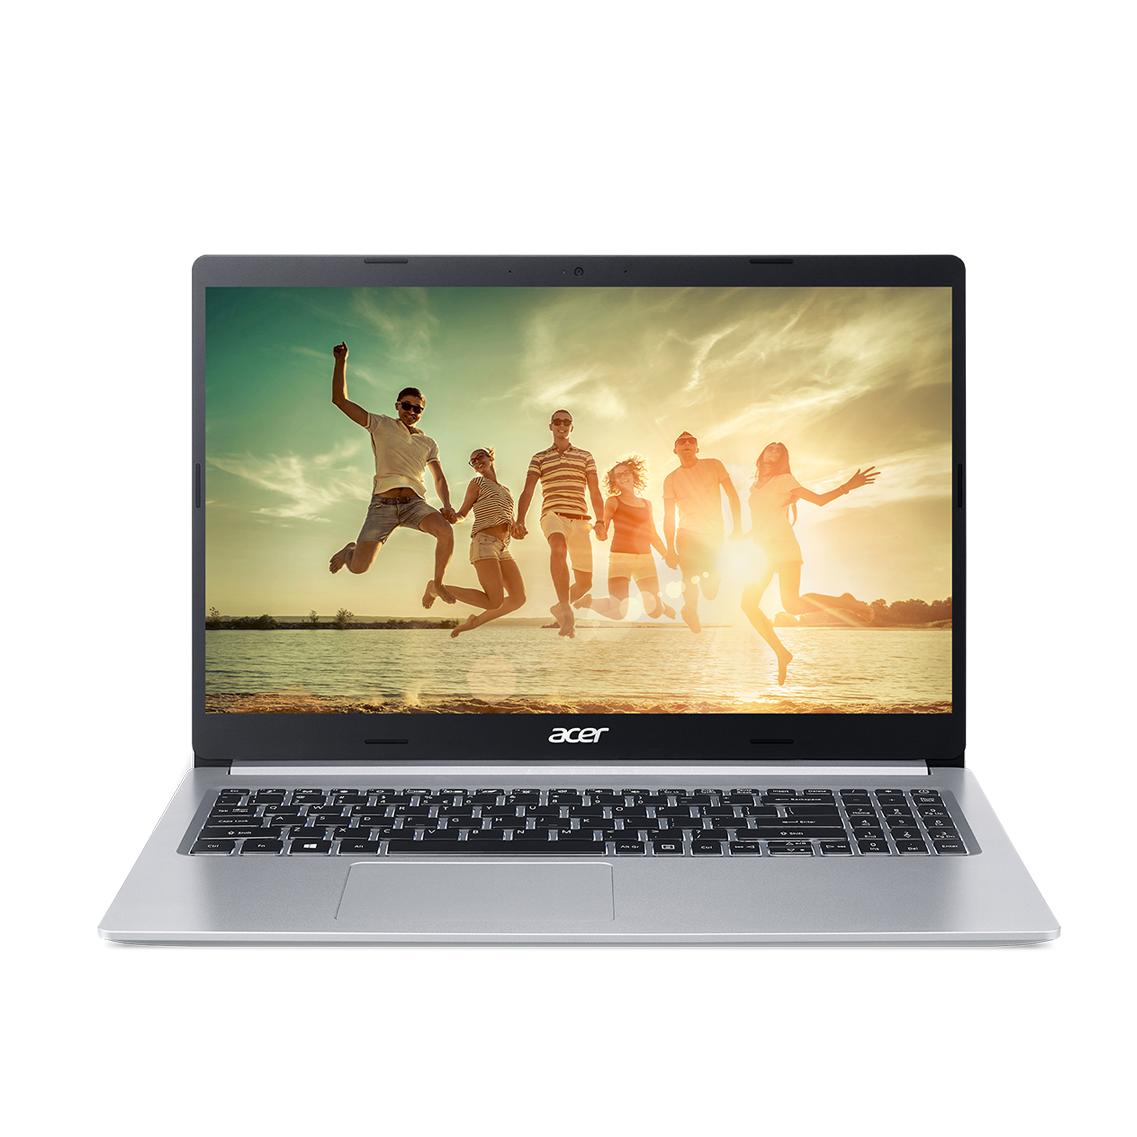 Laptop Acer Aspire 5 A515-55G-5633 (NX.HZFSV.002) (i5 1035G1/8GB RAM/512GB SSD/MX350 2G/15.6 inch FHD/Win10/Bạc)